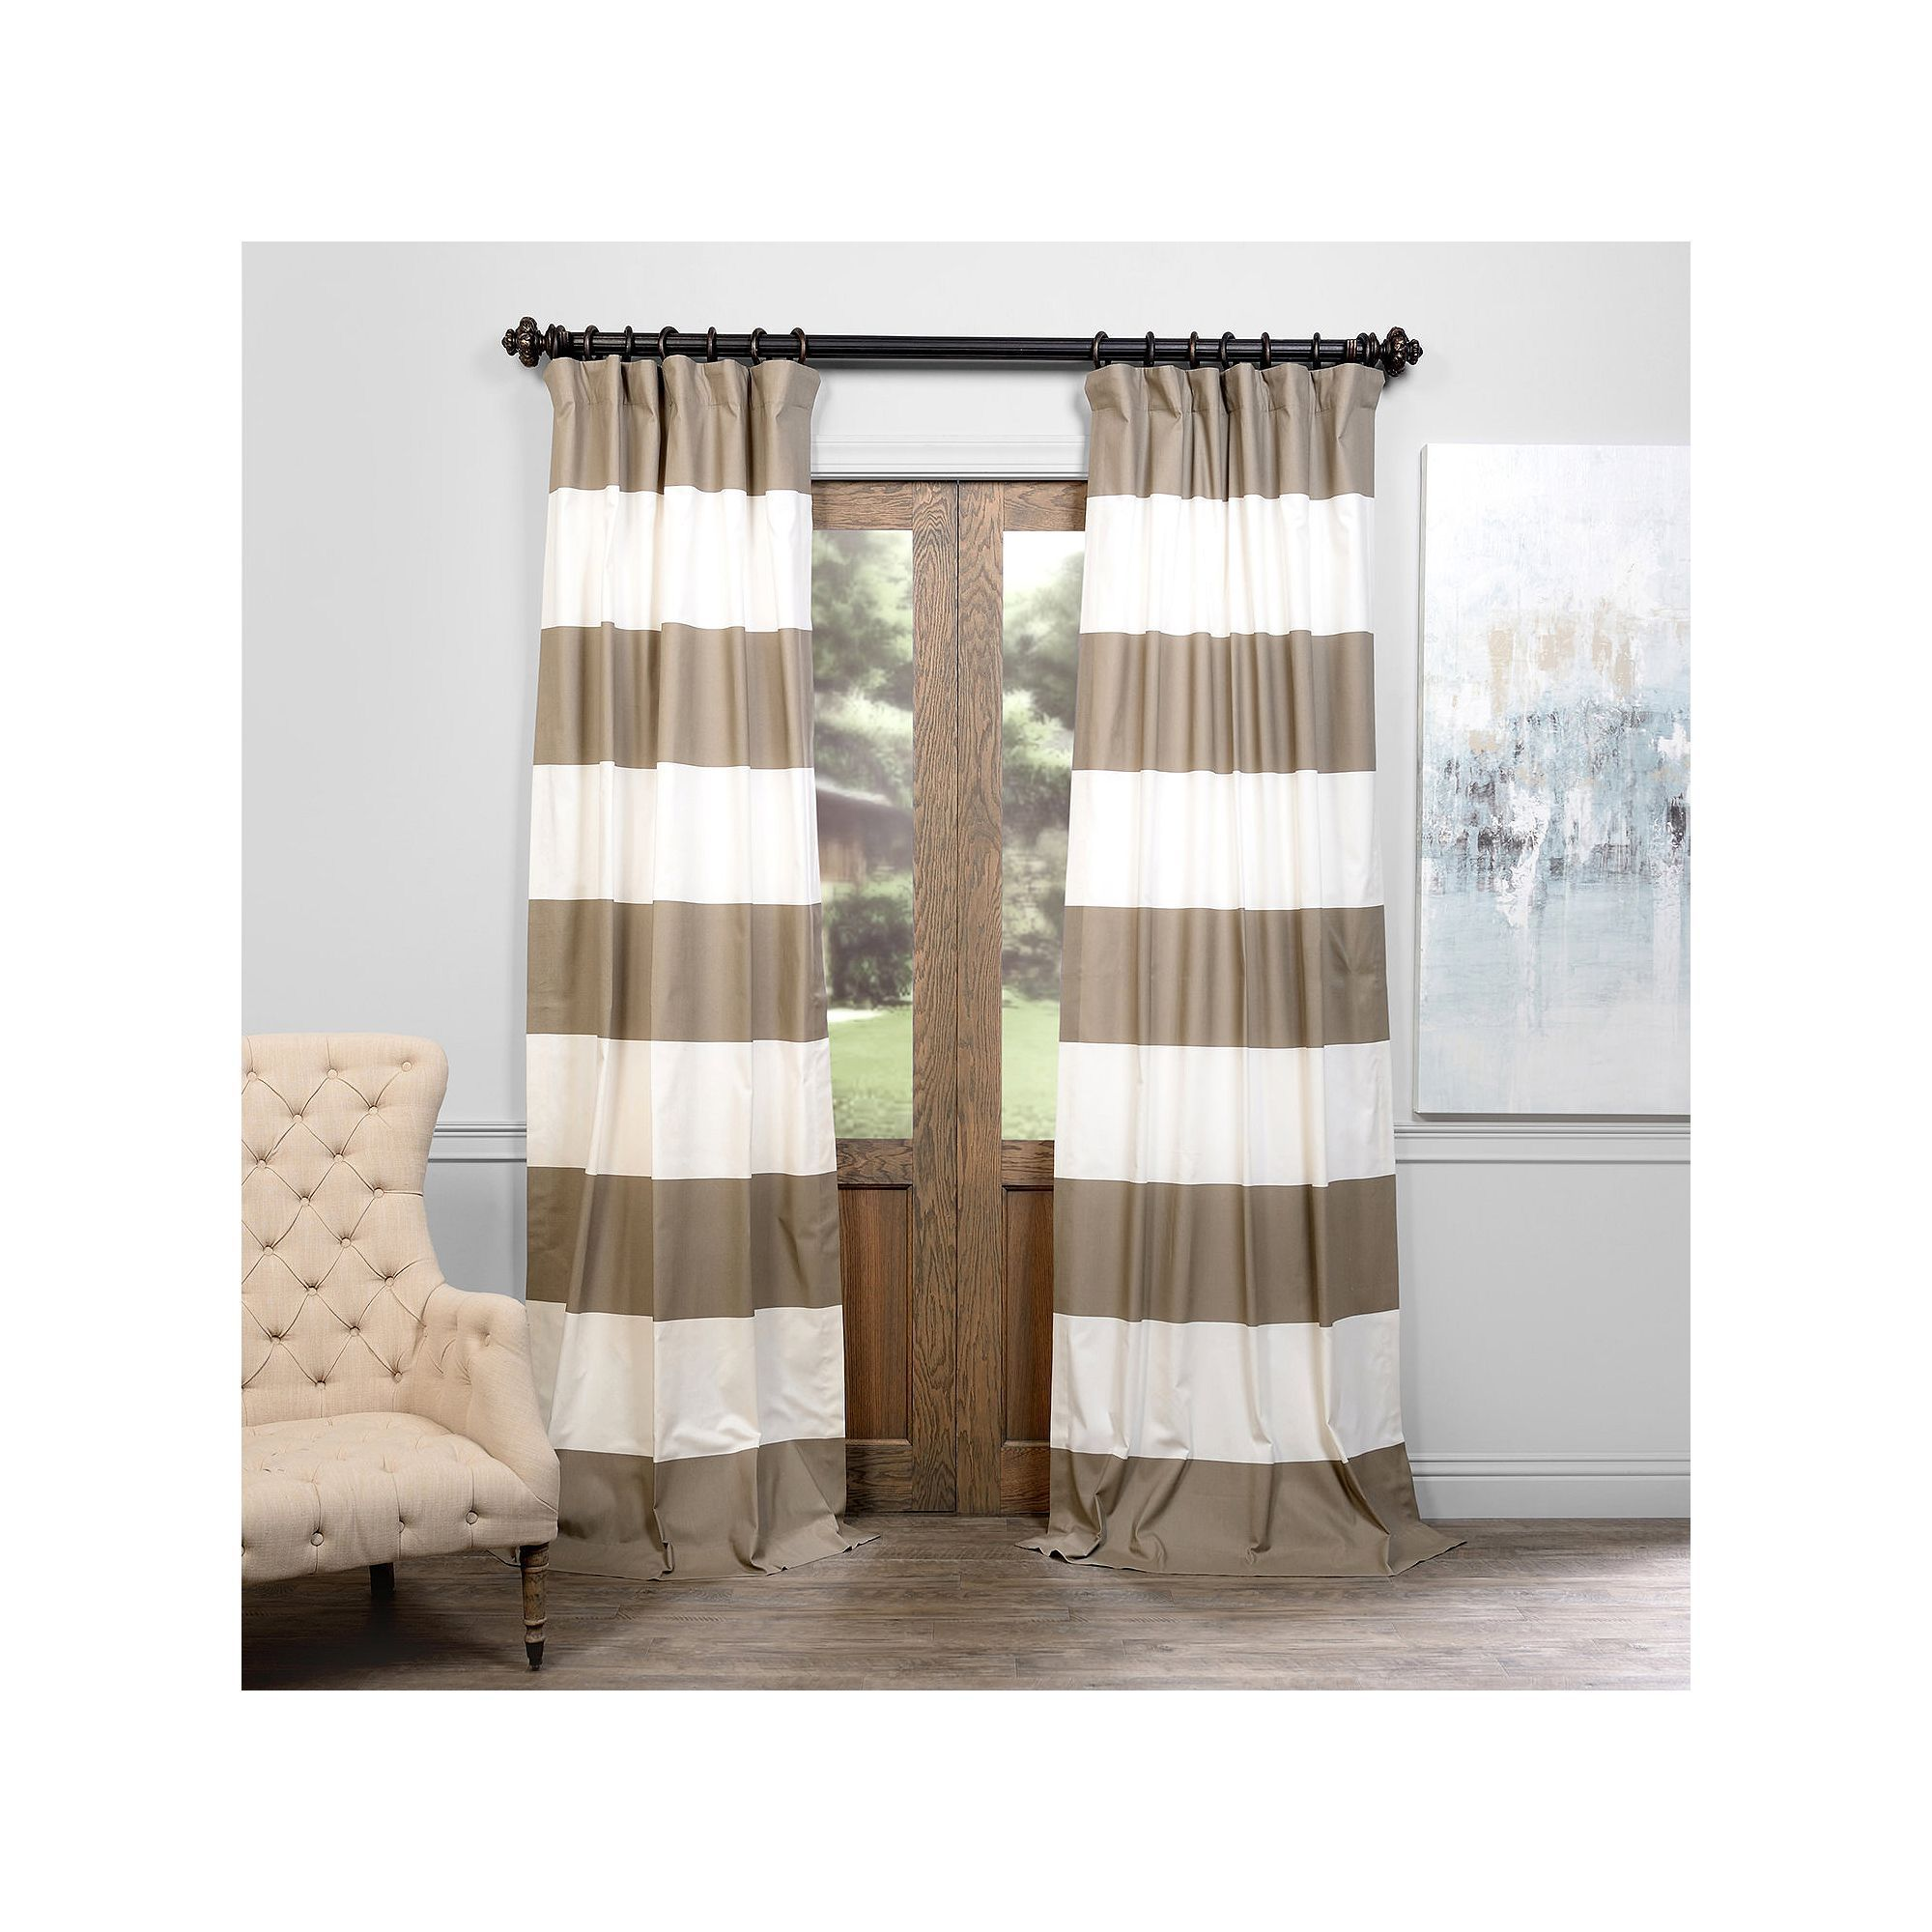 Eff stripe cotton window curtain grey cotton curtains cotton and